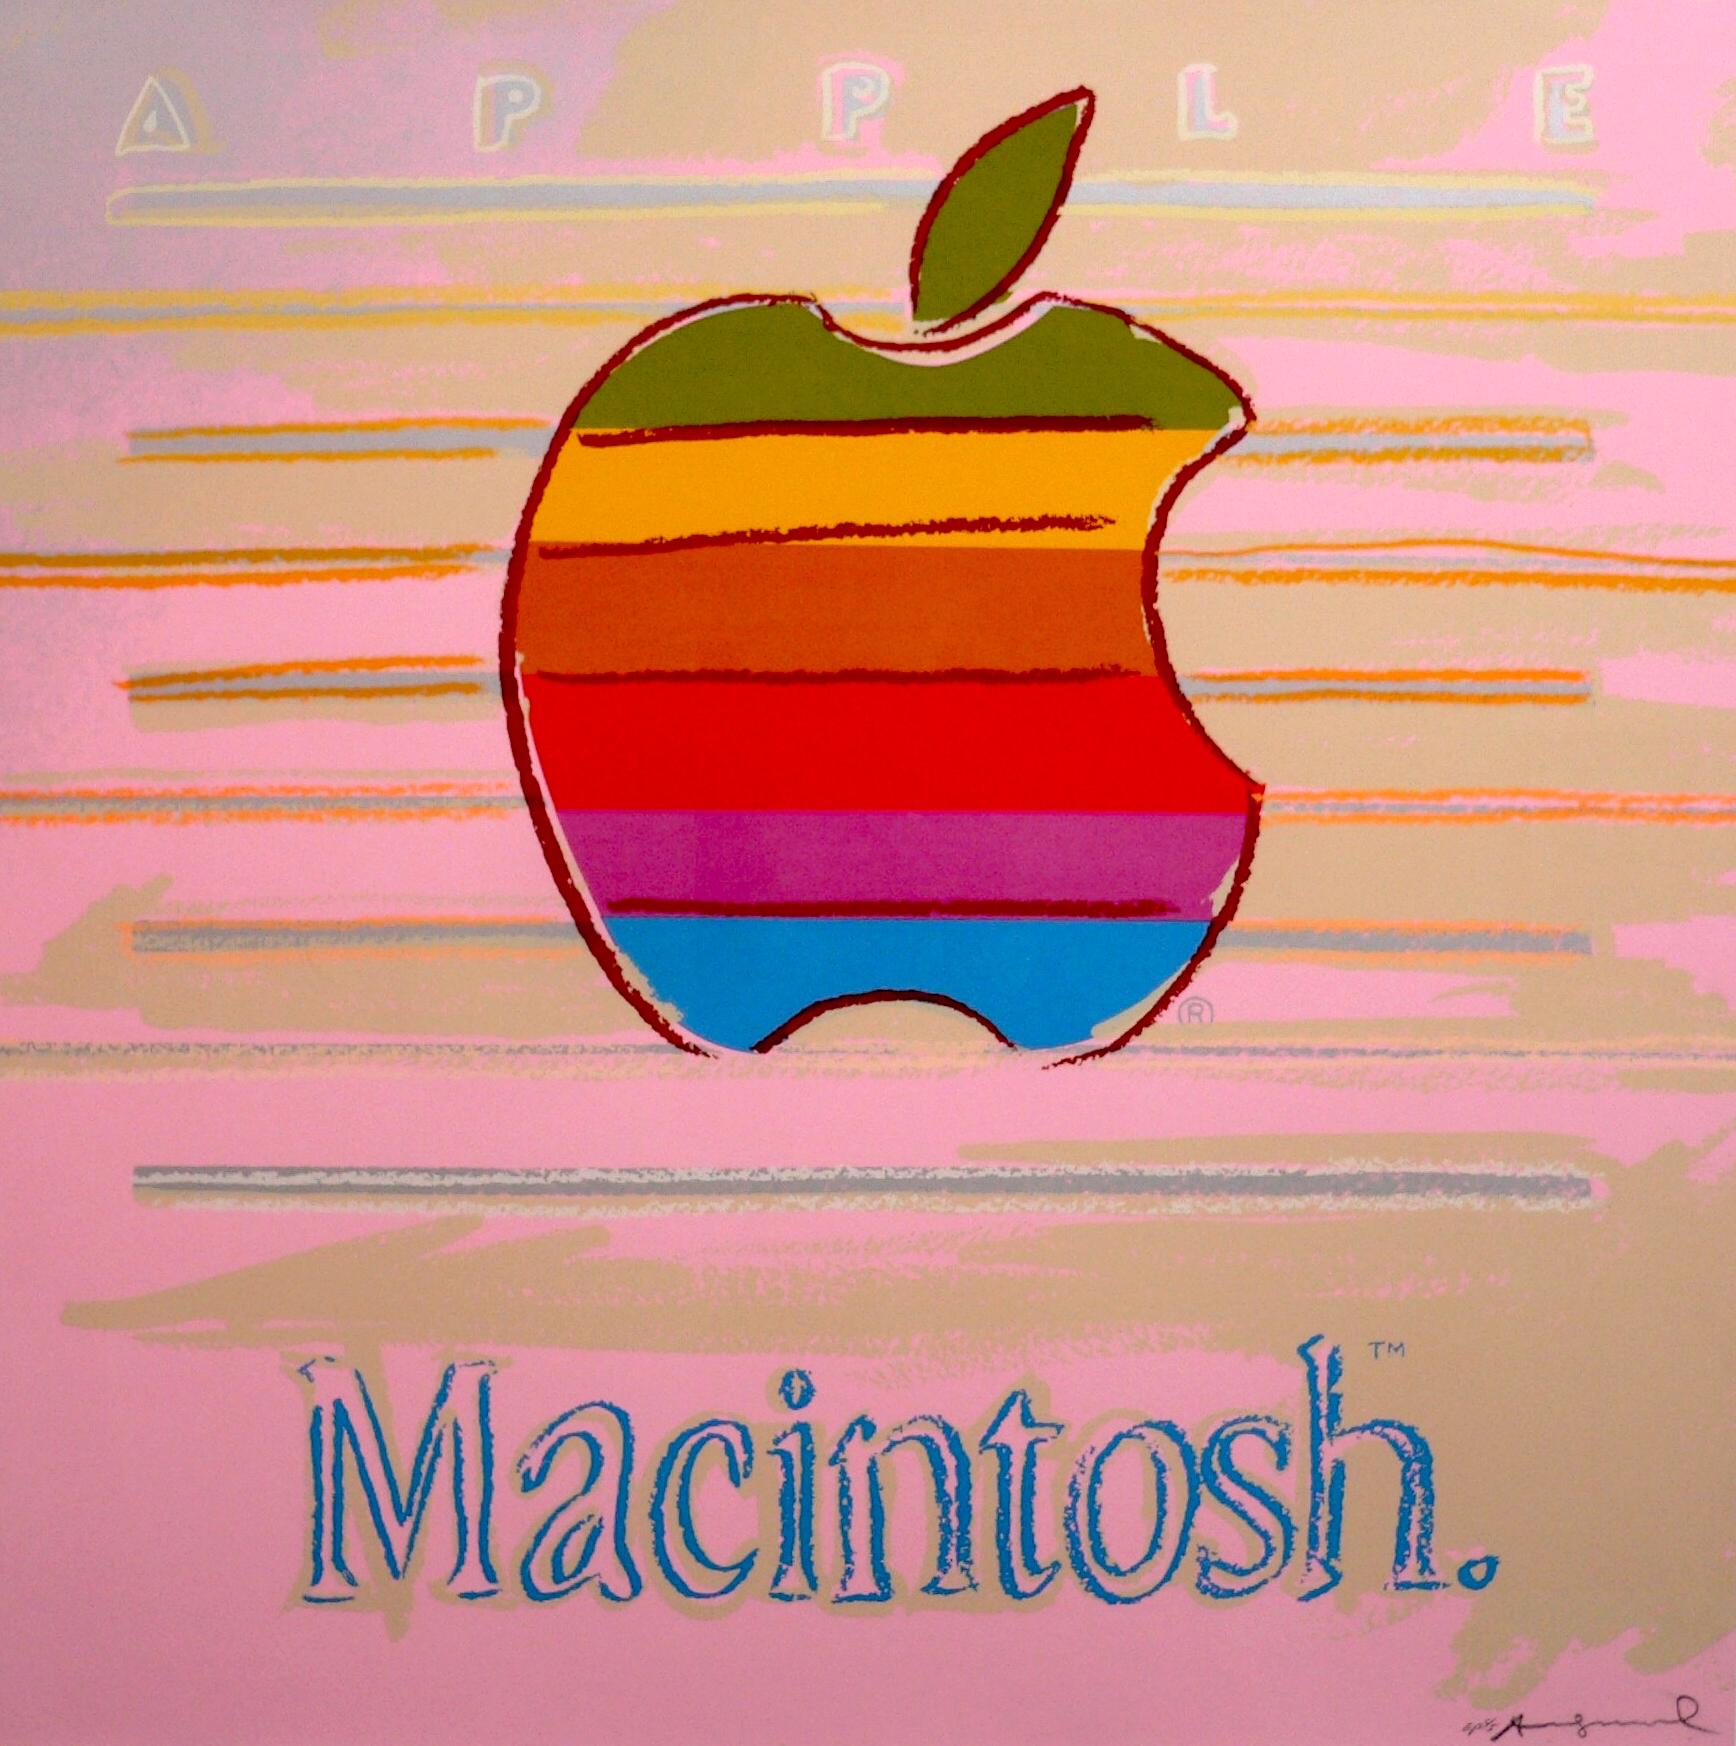 Apple (Macintosh) Ad by Andy Warhol